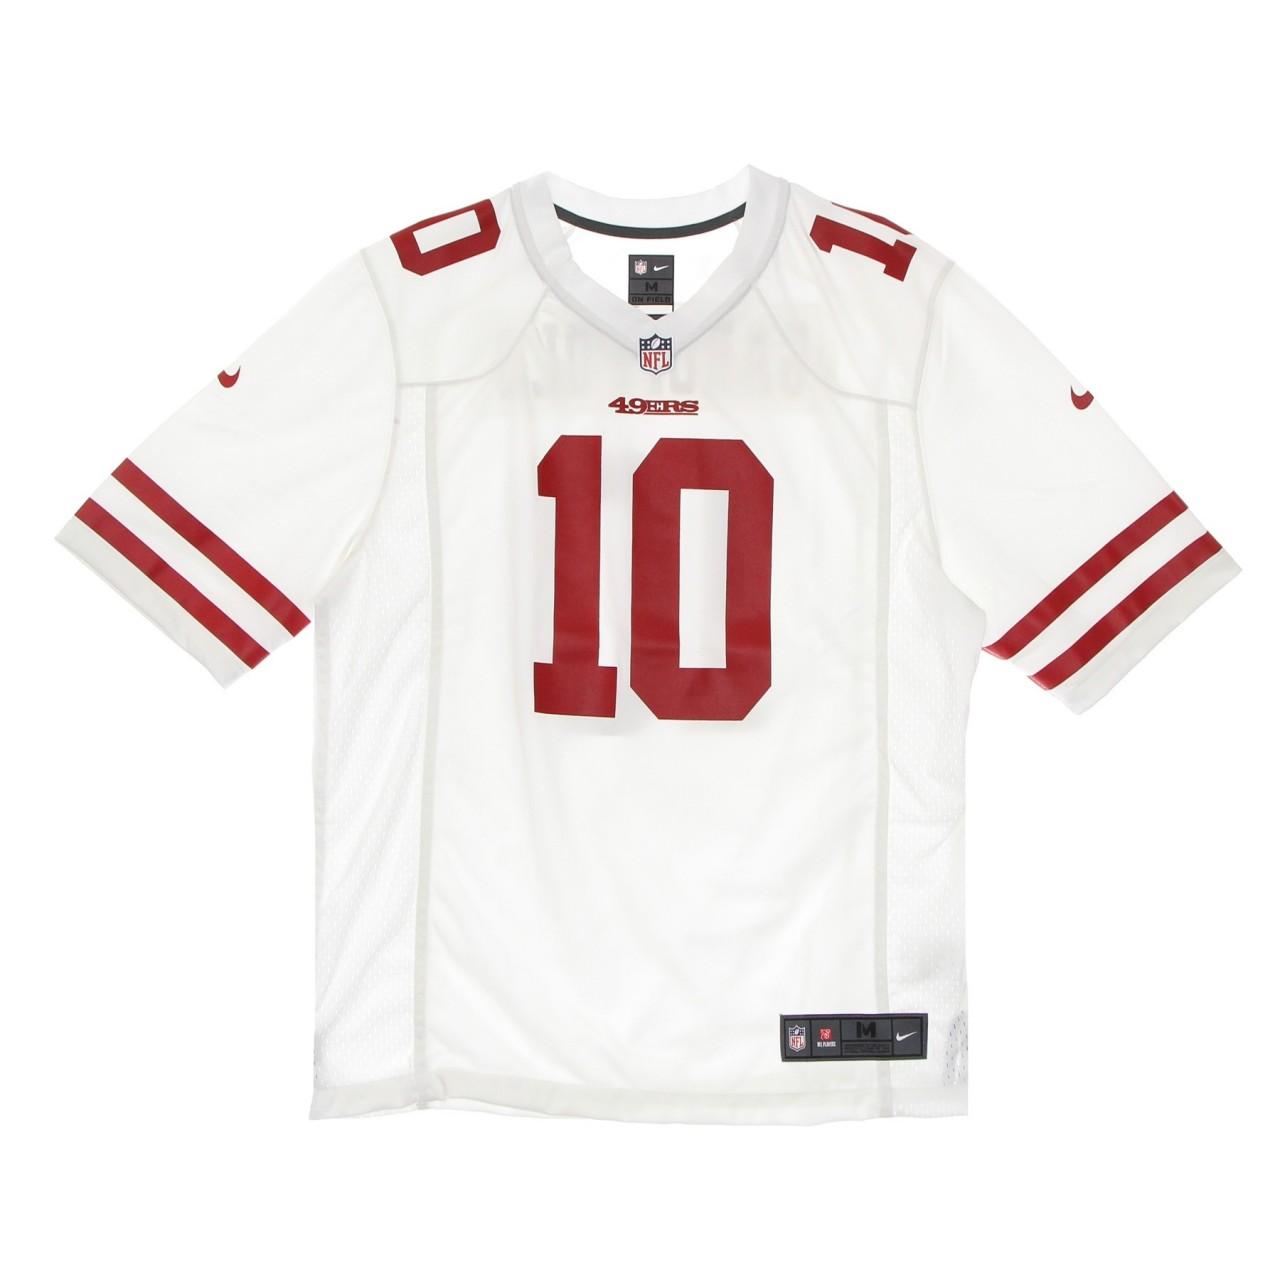 NIKE NFL NFL GAME ROAD JERSEY NO.10 GAROPPOLO SAF49E 67NM-SFGR-73F-2PA